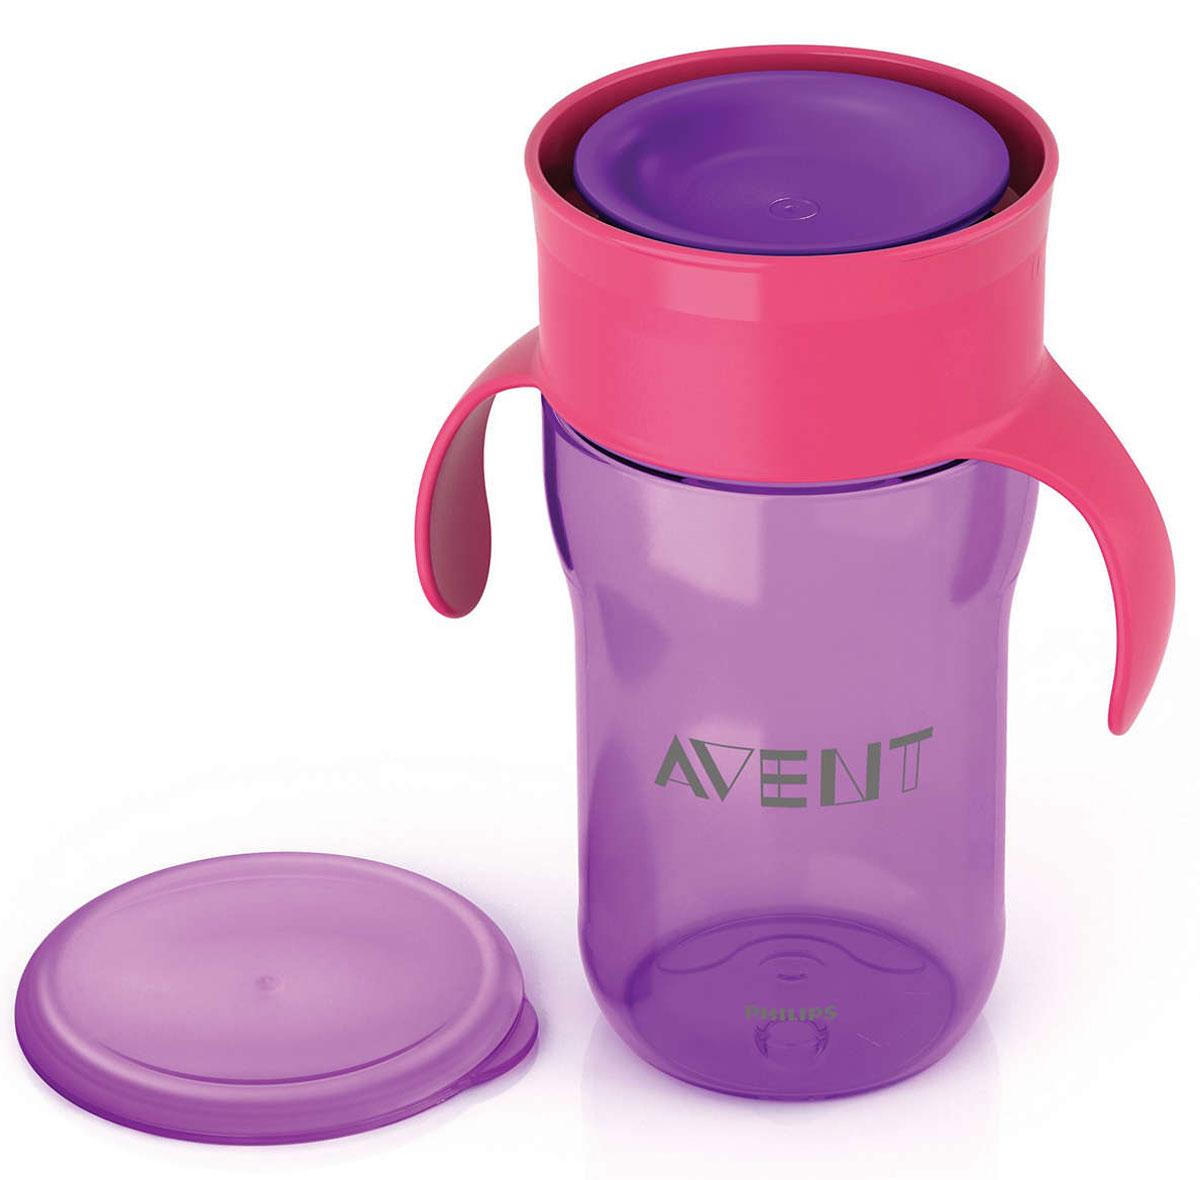 Philips Avent Взрослая чашка, 340 мл, 18м+, 1 шт фиолетовый SCF784/00 philips avent чашка поильник 260 мл 12м красный scf782 00